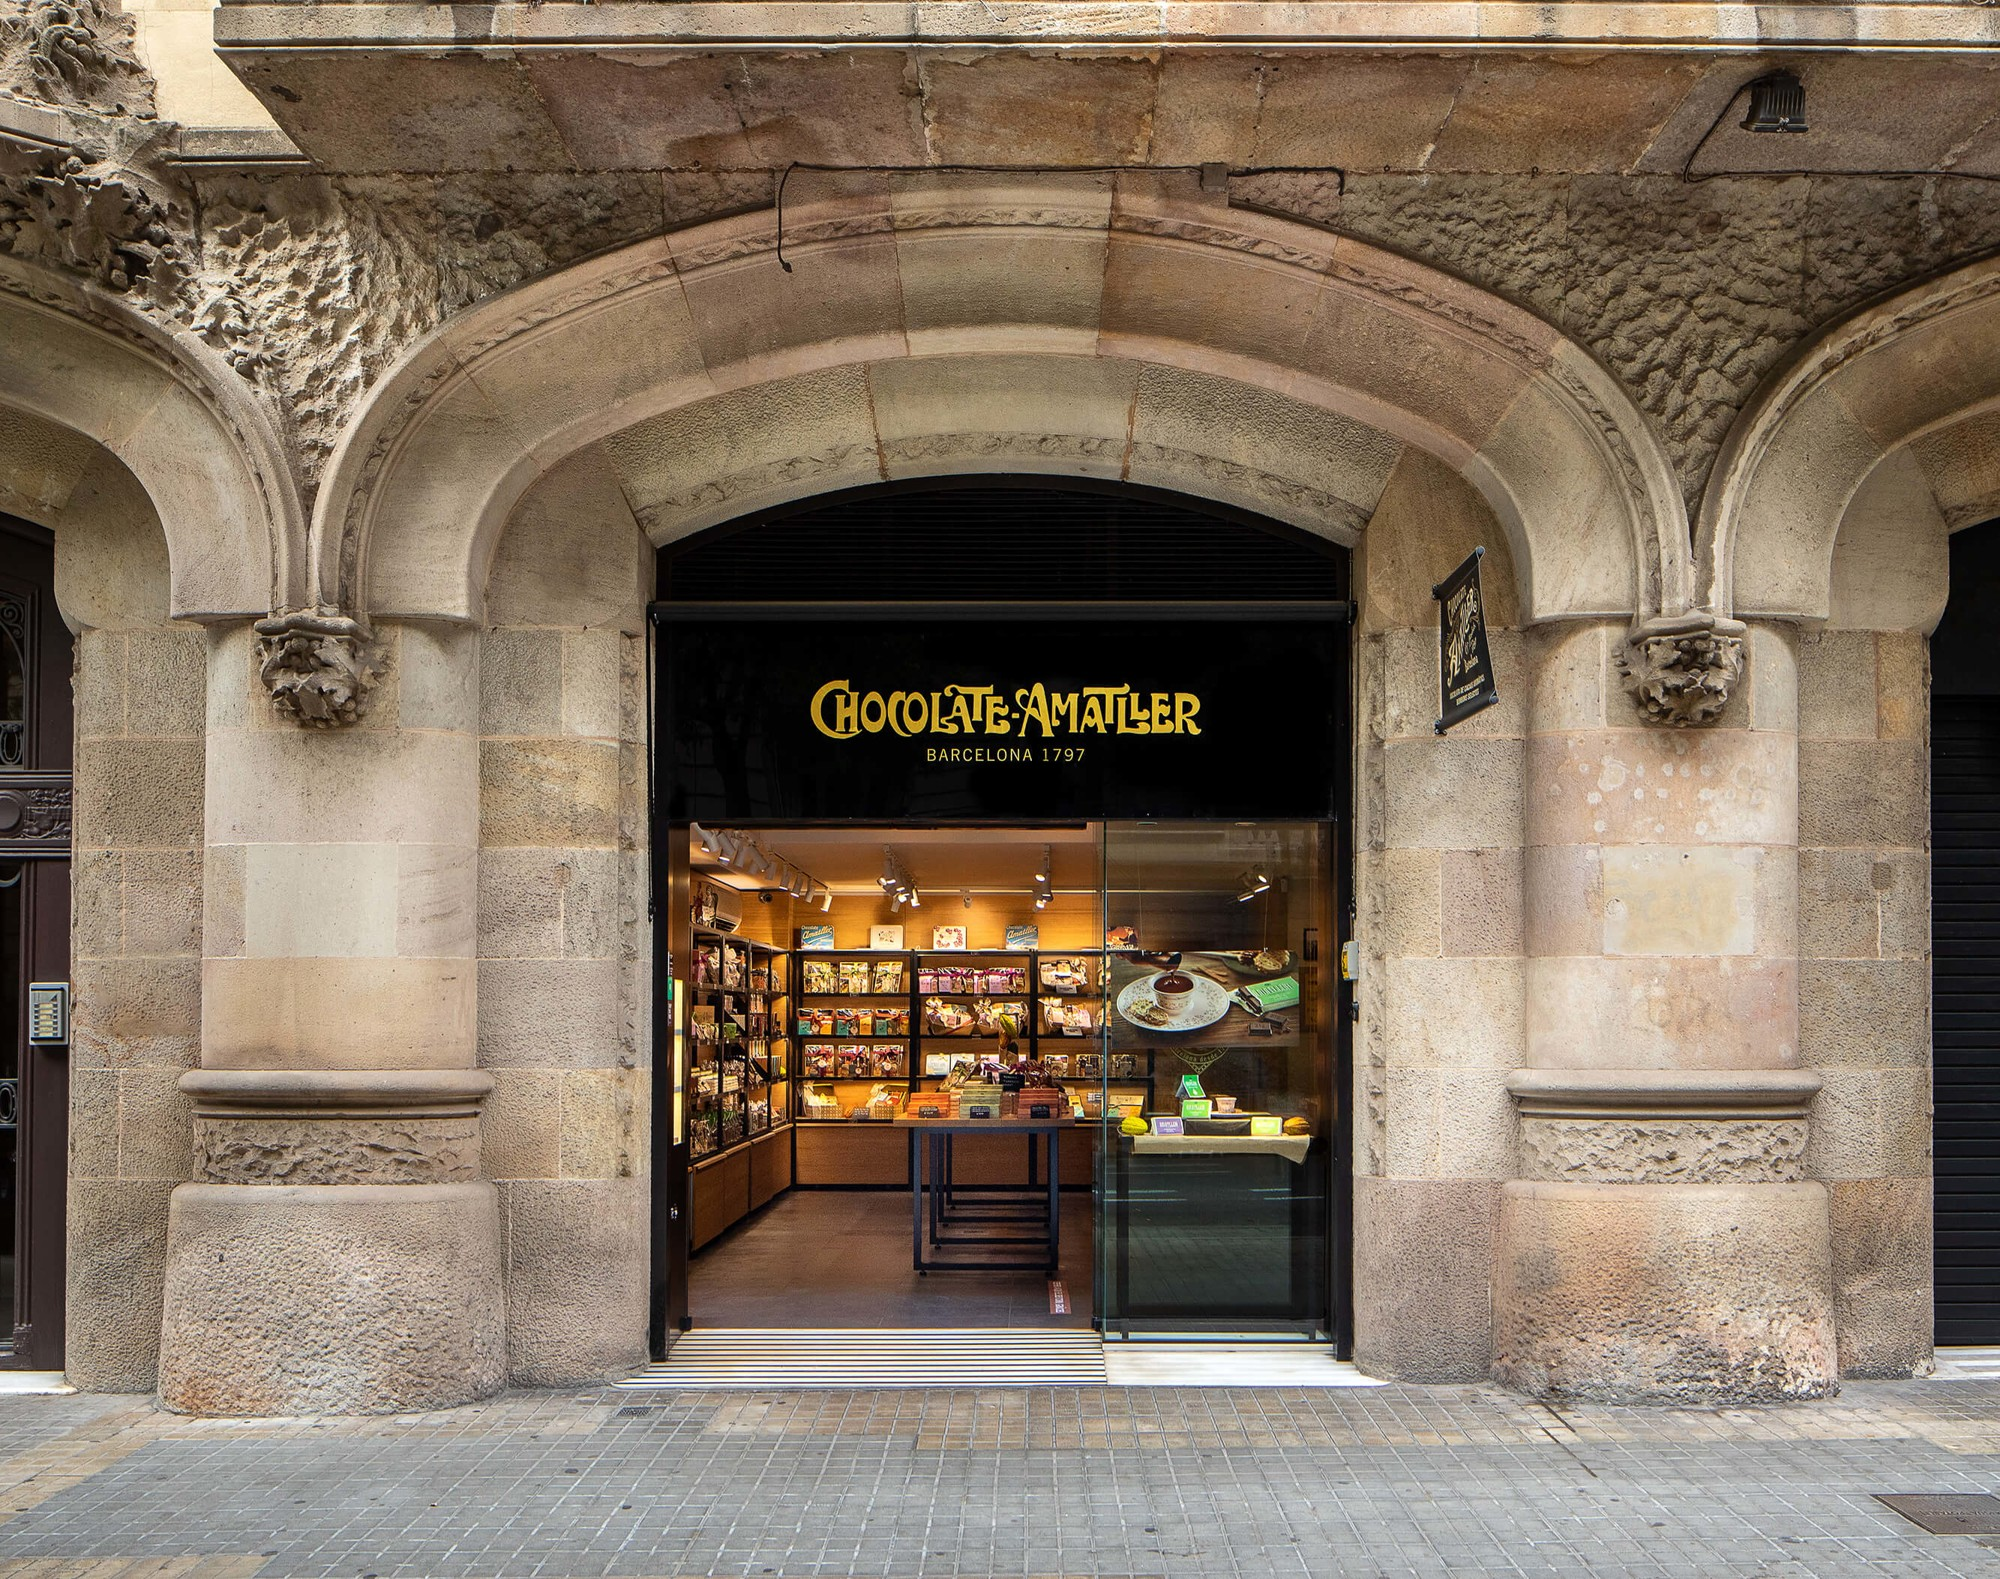 Façana de la botiga de Chocolate Amatller a la Pedrera a Barcelona